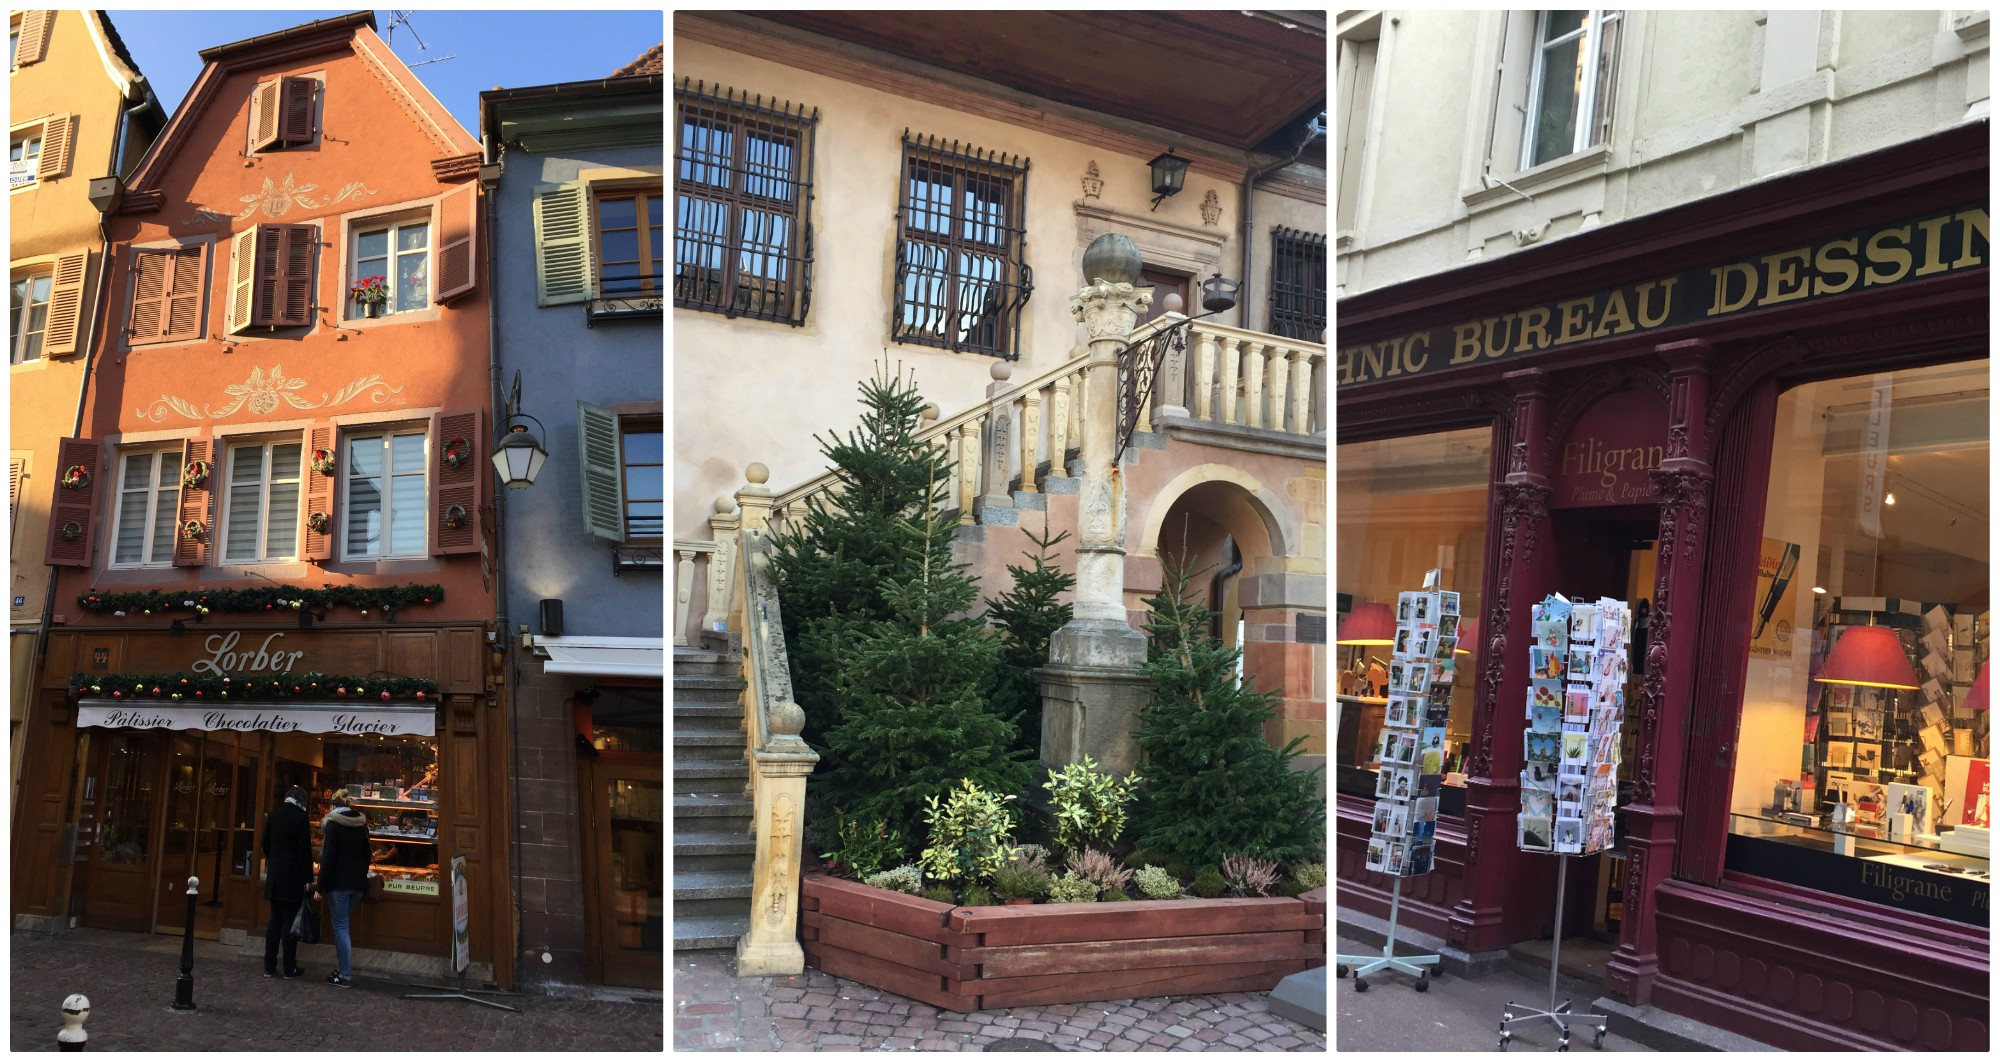 Location bureau à colmar m² à euros aim ymo